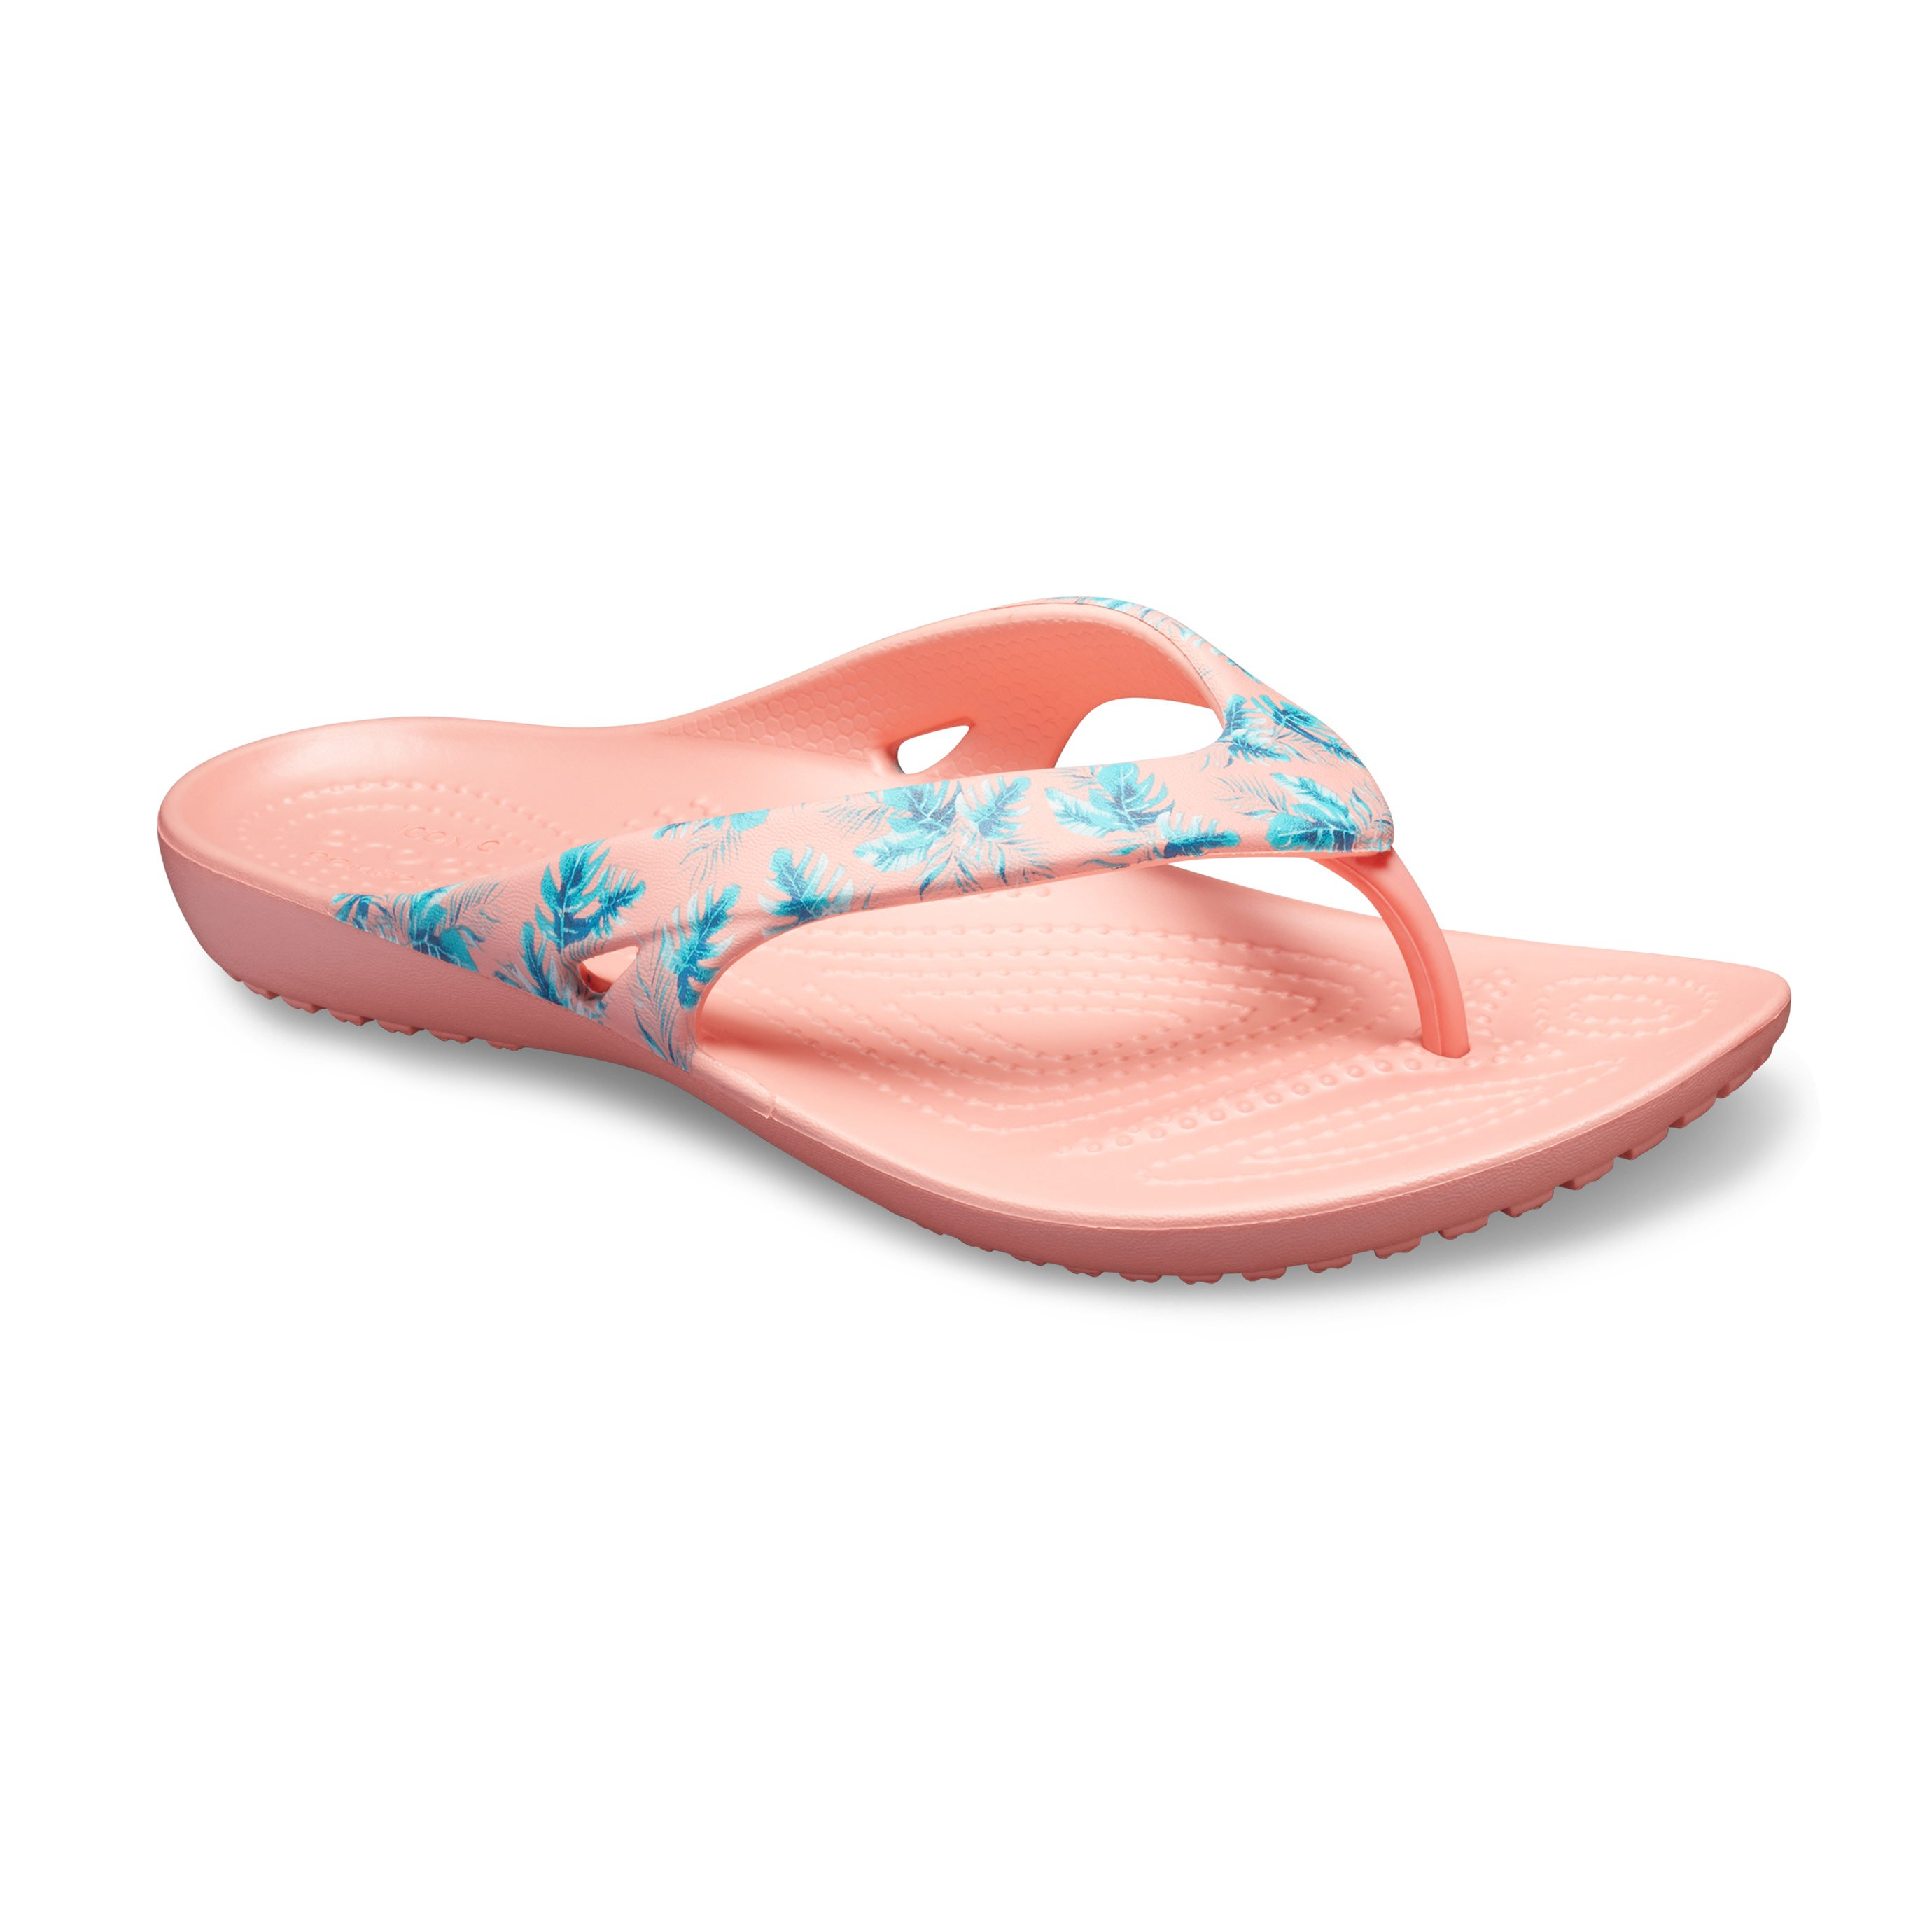 Crocs Kadee Ii Seasonal Flip - כפכף אצבע כתום עם הדפס טרופי